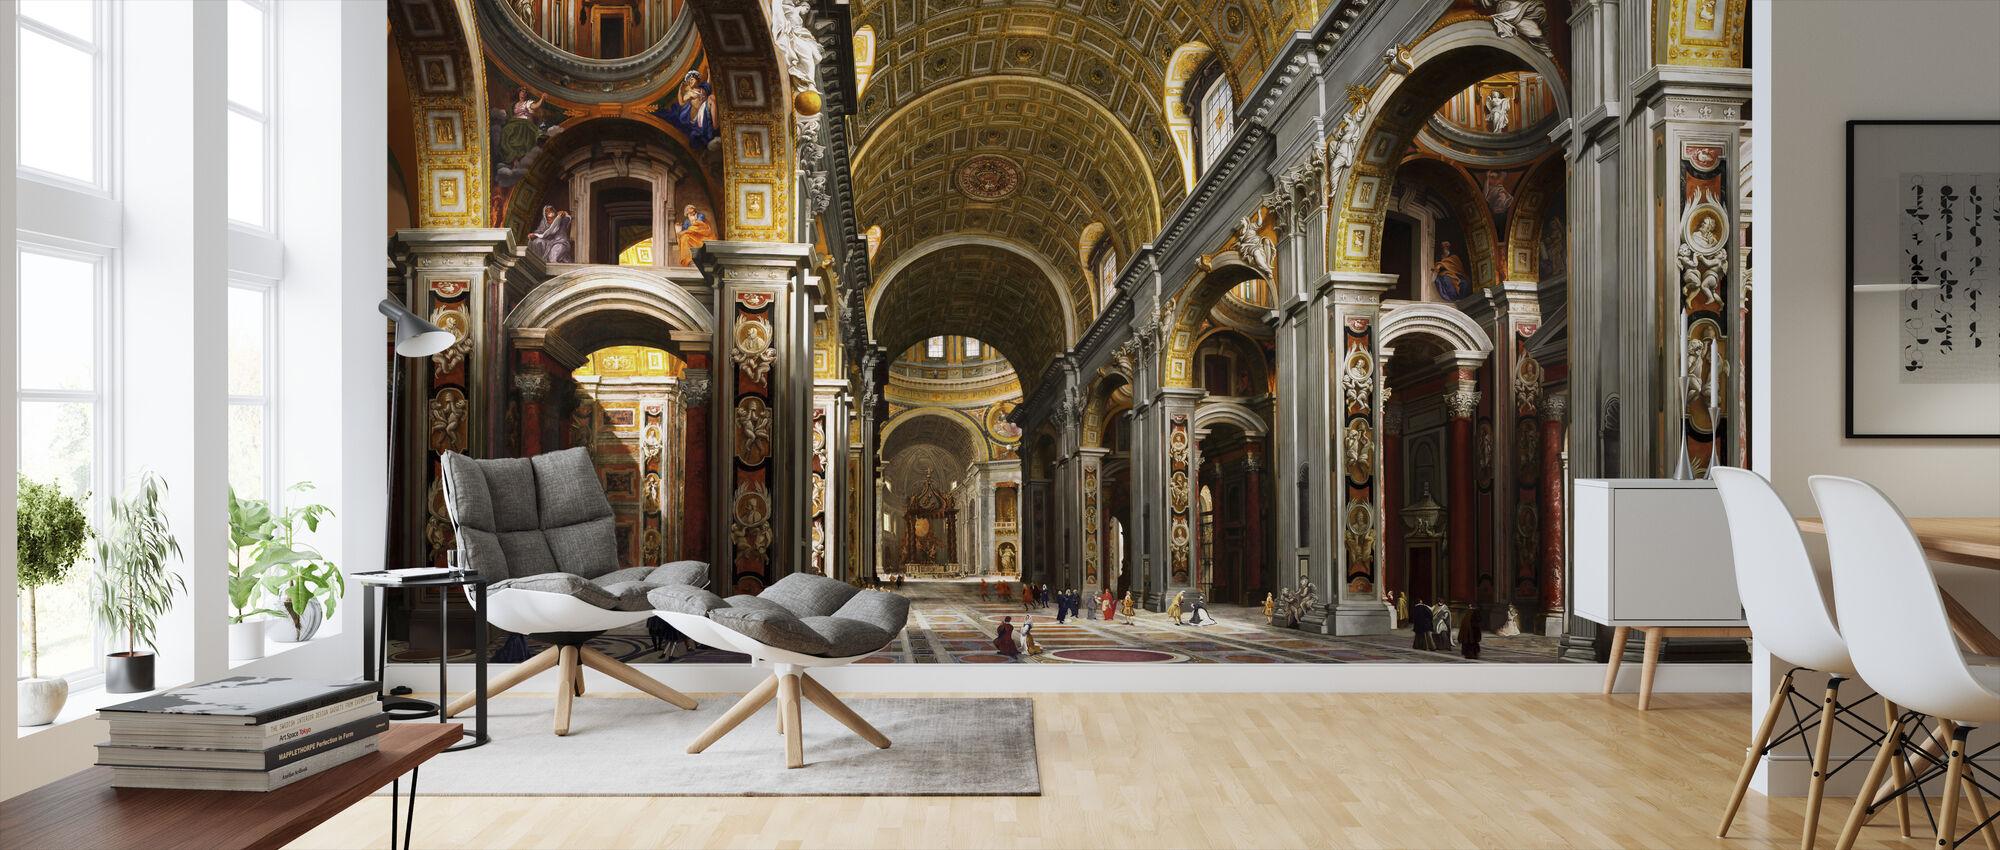 St Peters Basilica - Rome - Wallpaper - Living Room